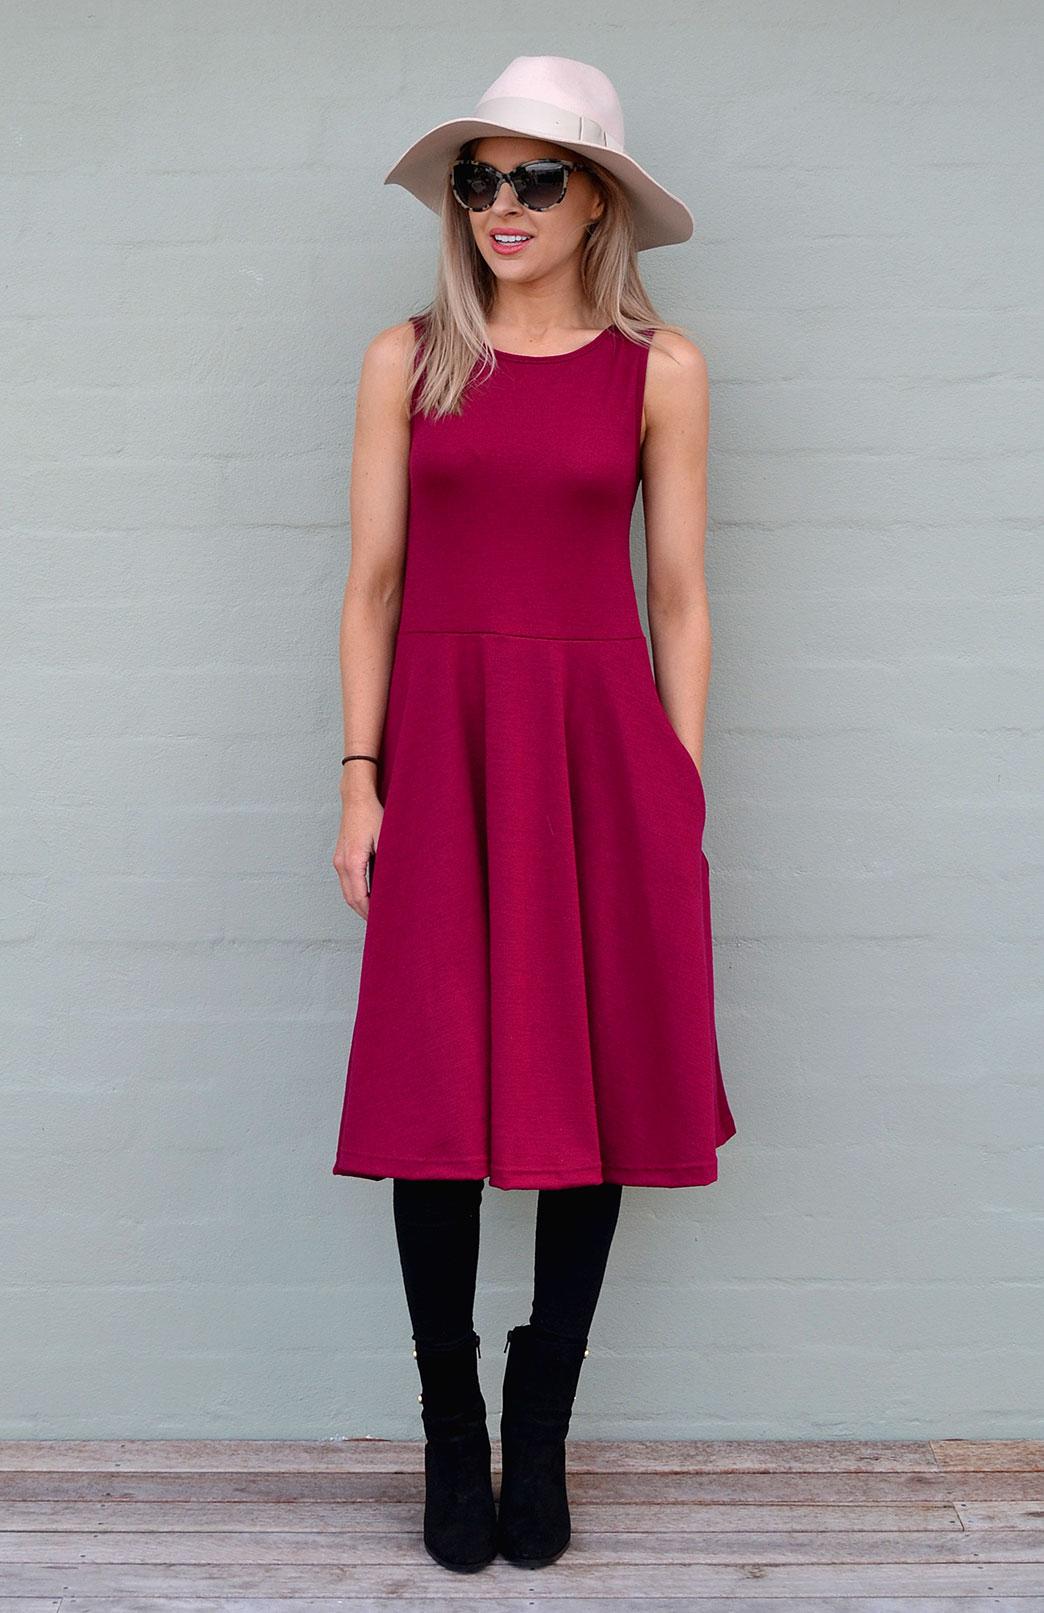 MaryAnn Fit and Flare Dress - Women's Merino Wool Sleeveless Mary Dress with Pockets - Smitten Merino Tasmania Australia